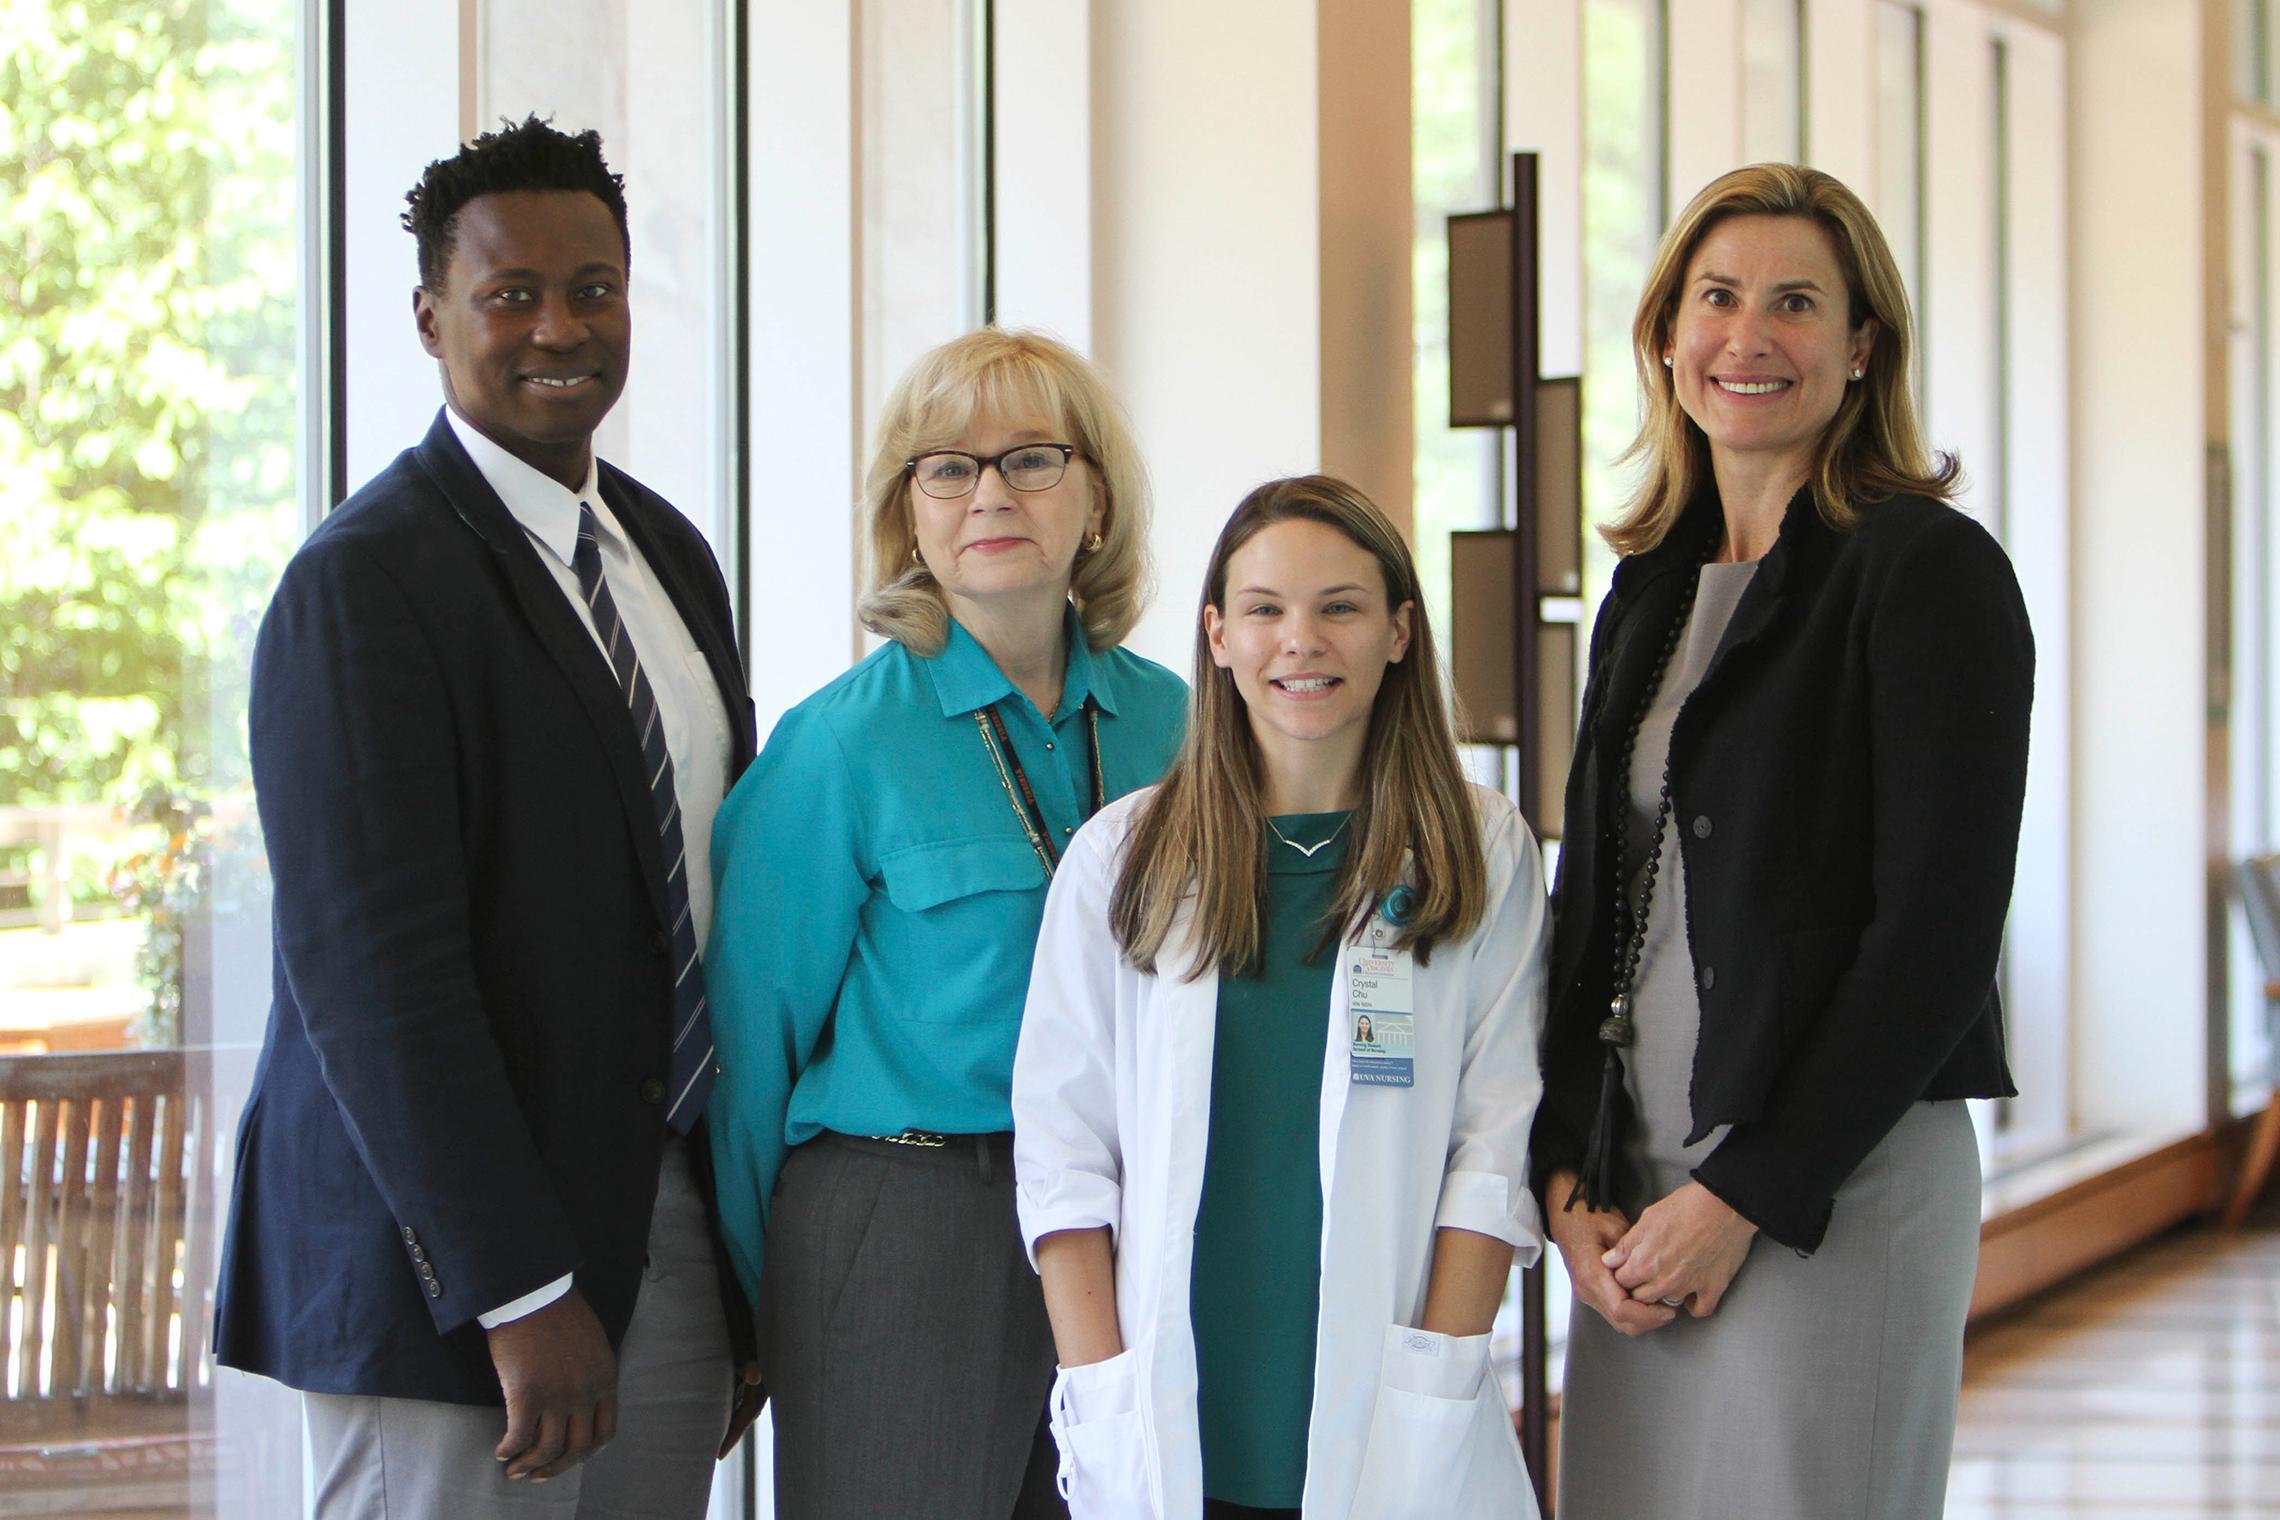 Randy Jones, professor of nursing; Pat Hollen, professor emerita of nursing; Crystal Chu, graduate nursing student; and Dr. Lynn Dengel, a surgeon at the UVA Medical Center. (Photo by Shannon Reres, University Communications)